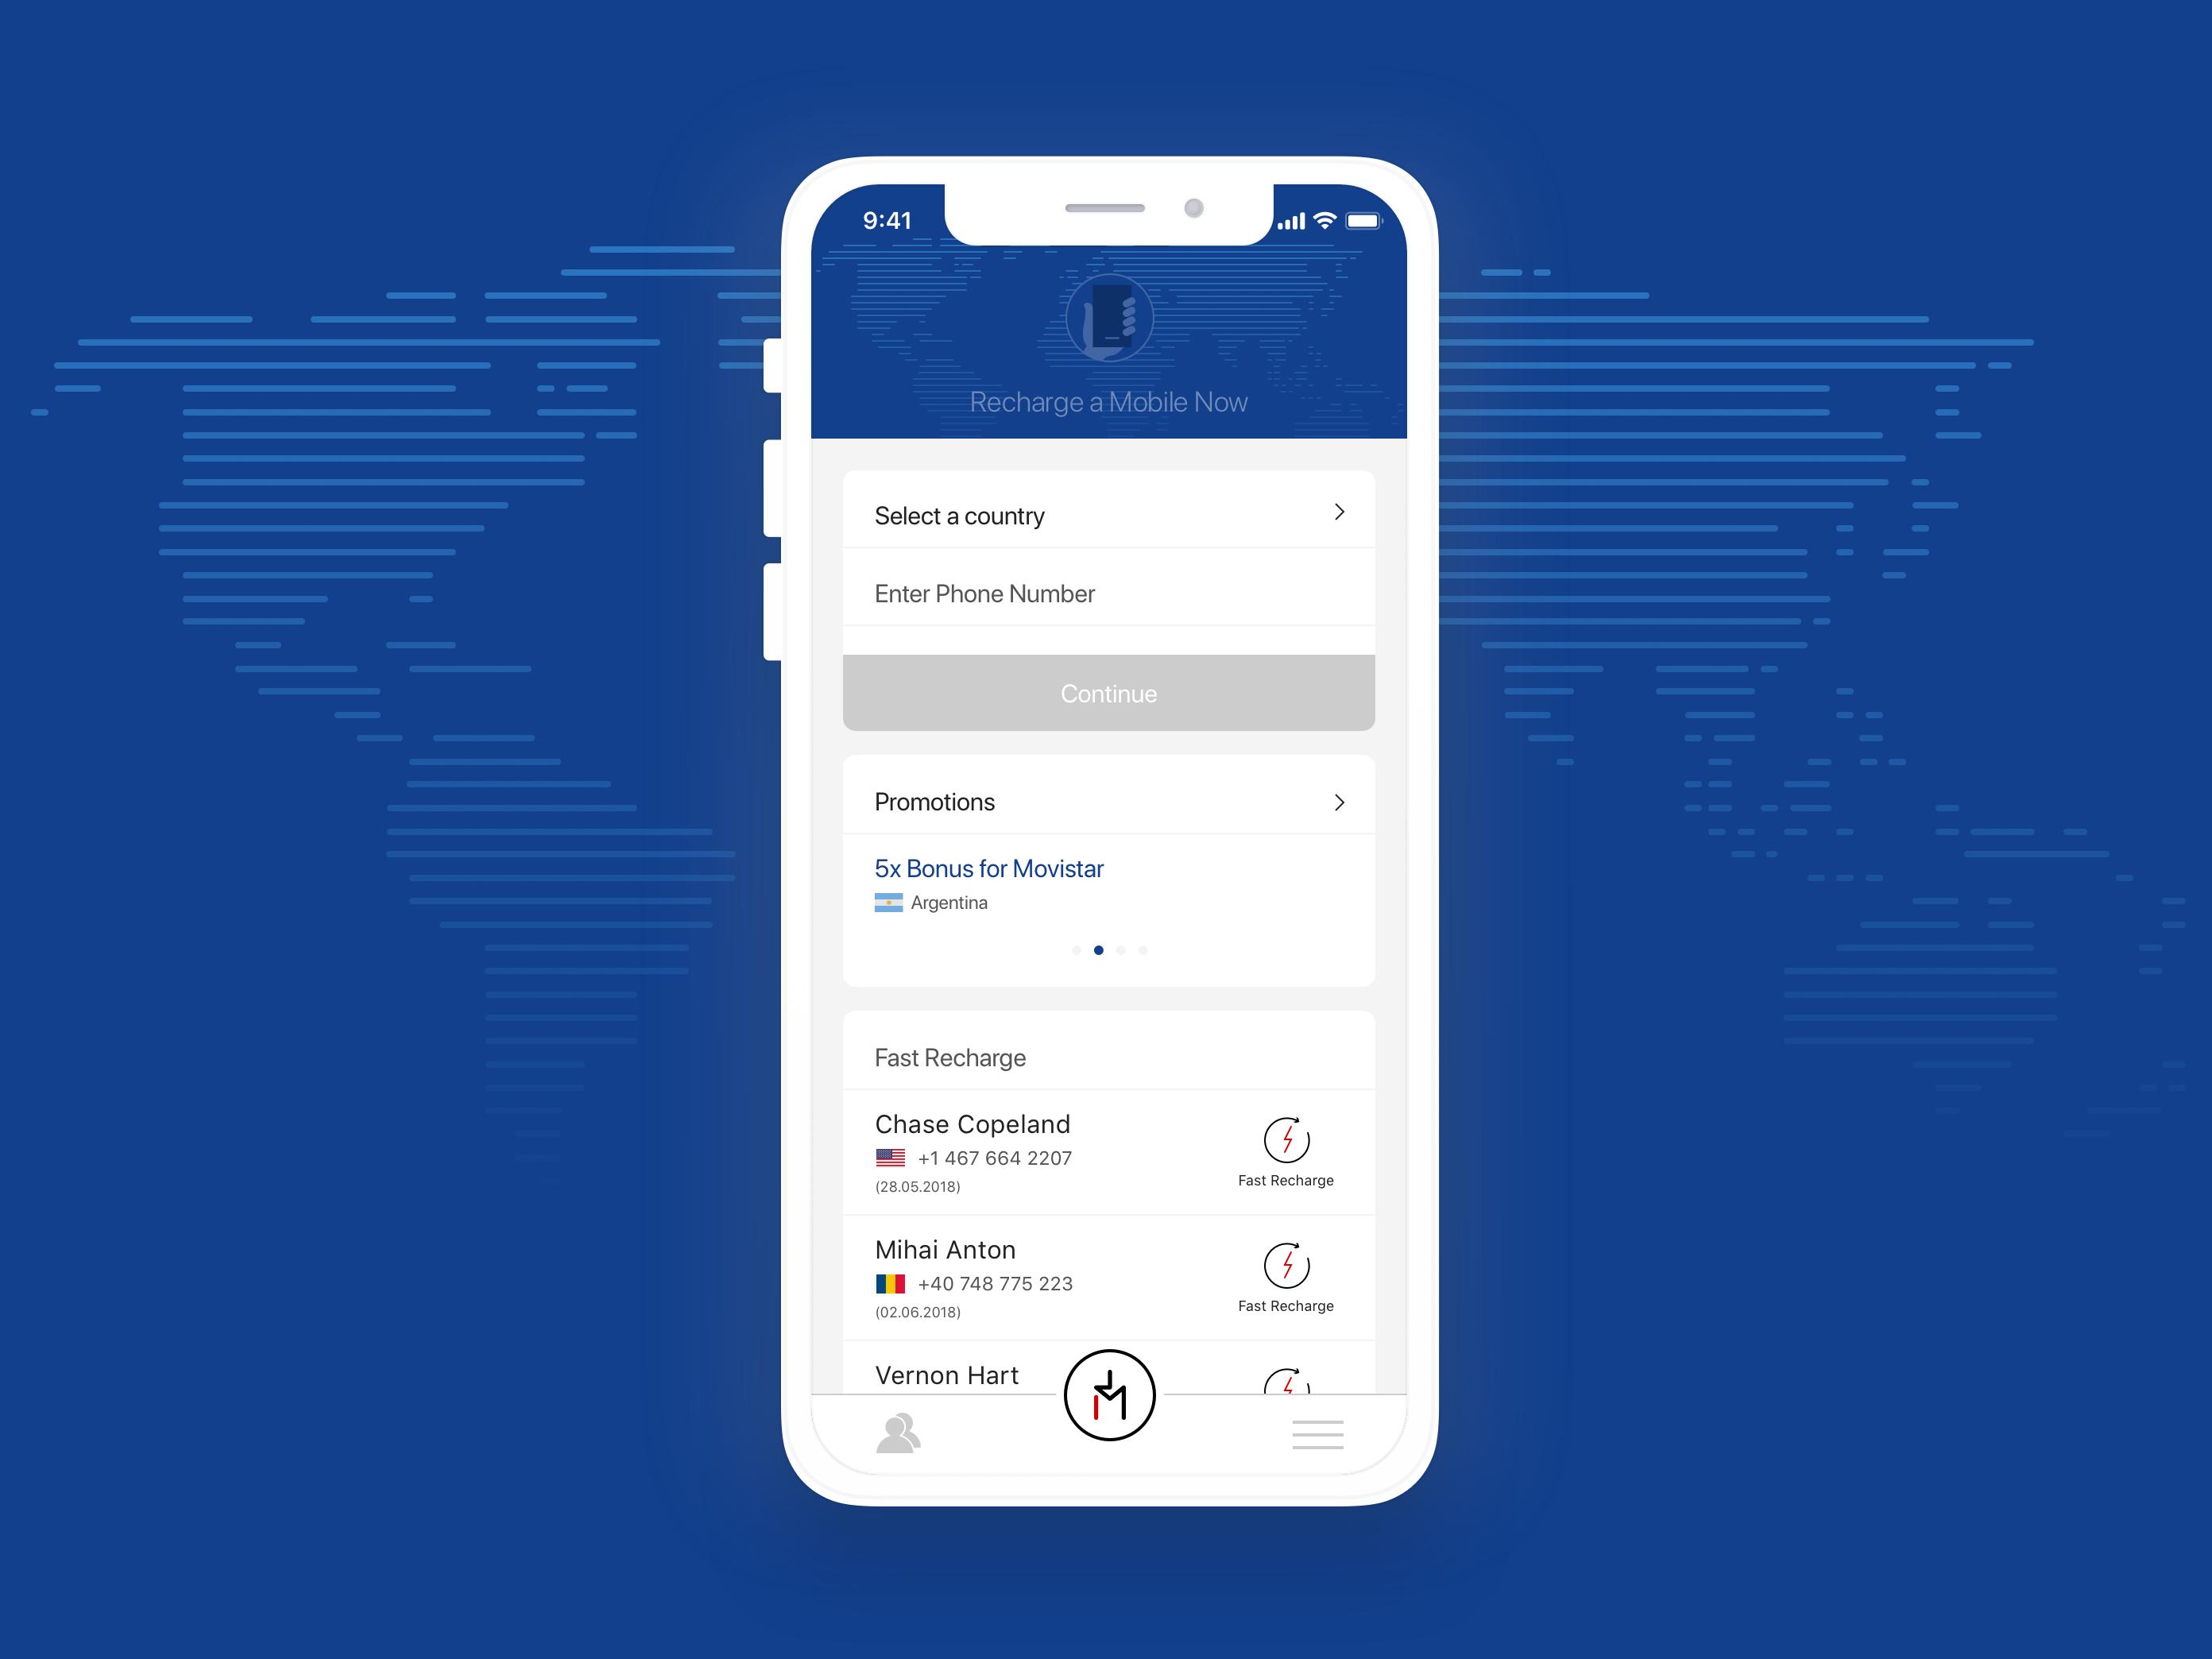 Mobile Recharge App - Home Screen | Telecom Apps | App home screen